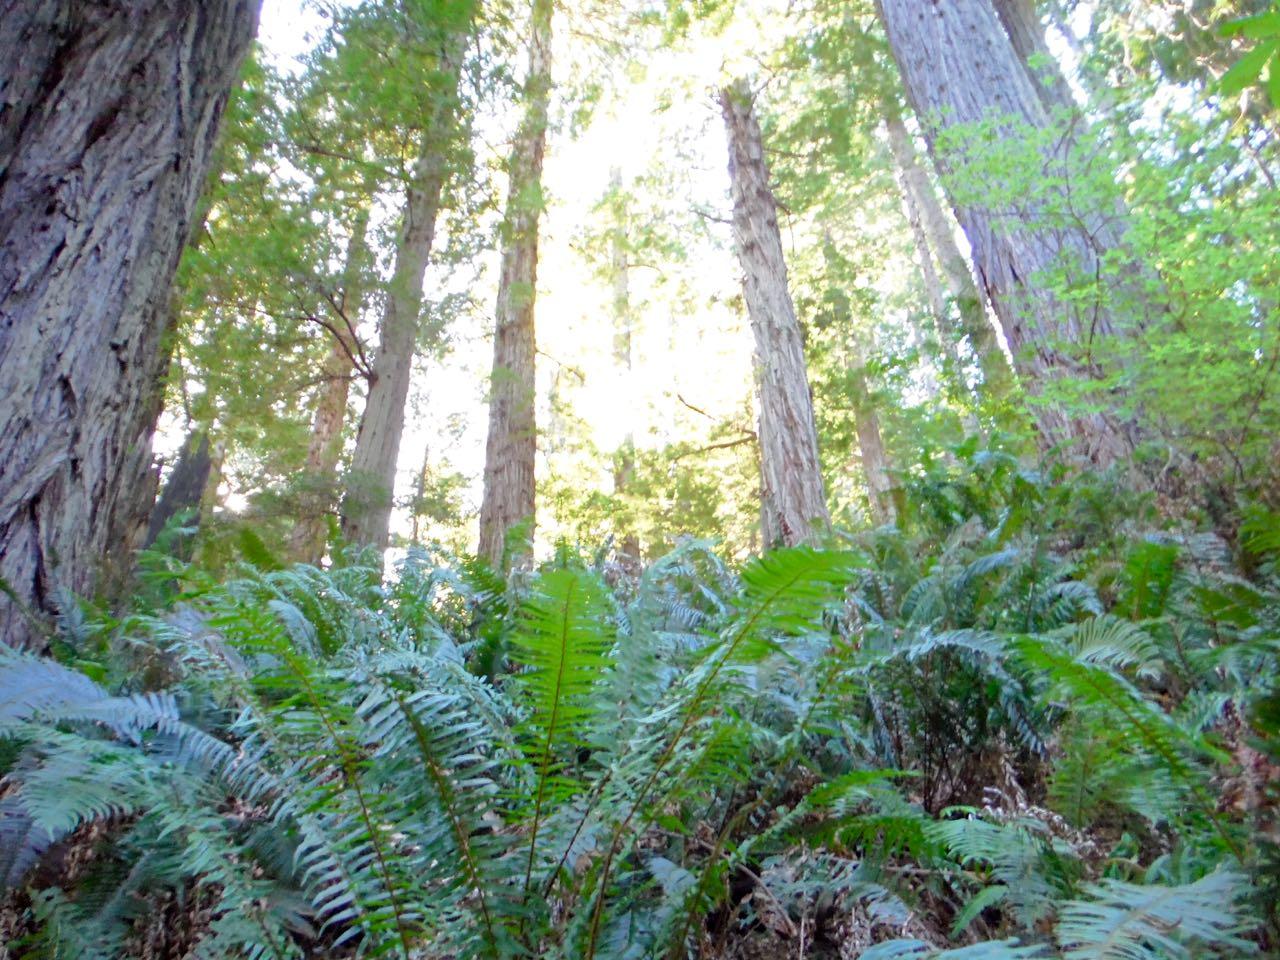 Redwoods 2017 10 08 237 Of 287